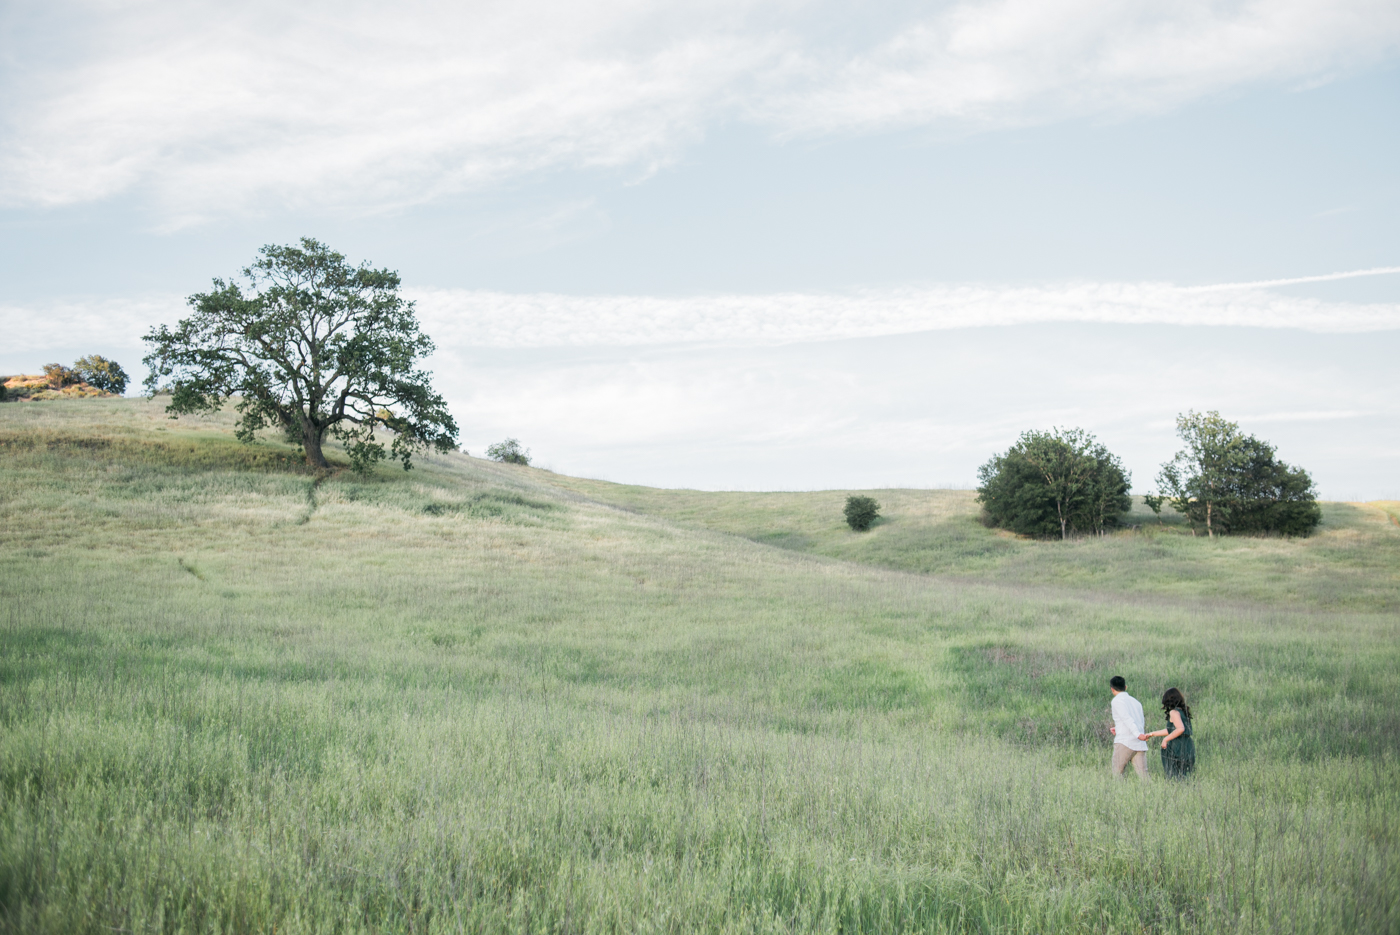 dianne&christian-malibu-creek-state-park-engagement-session-photography-los-angeles-based-wedding-photographer-4.jpg